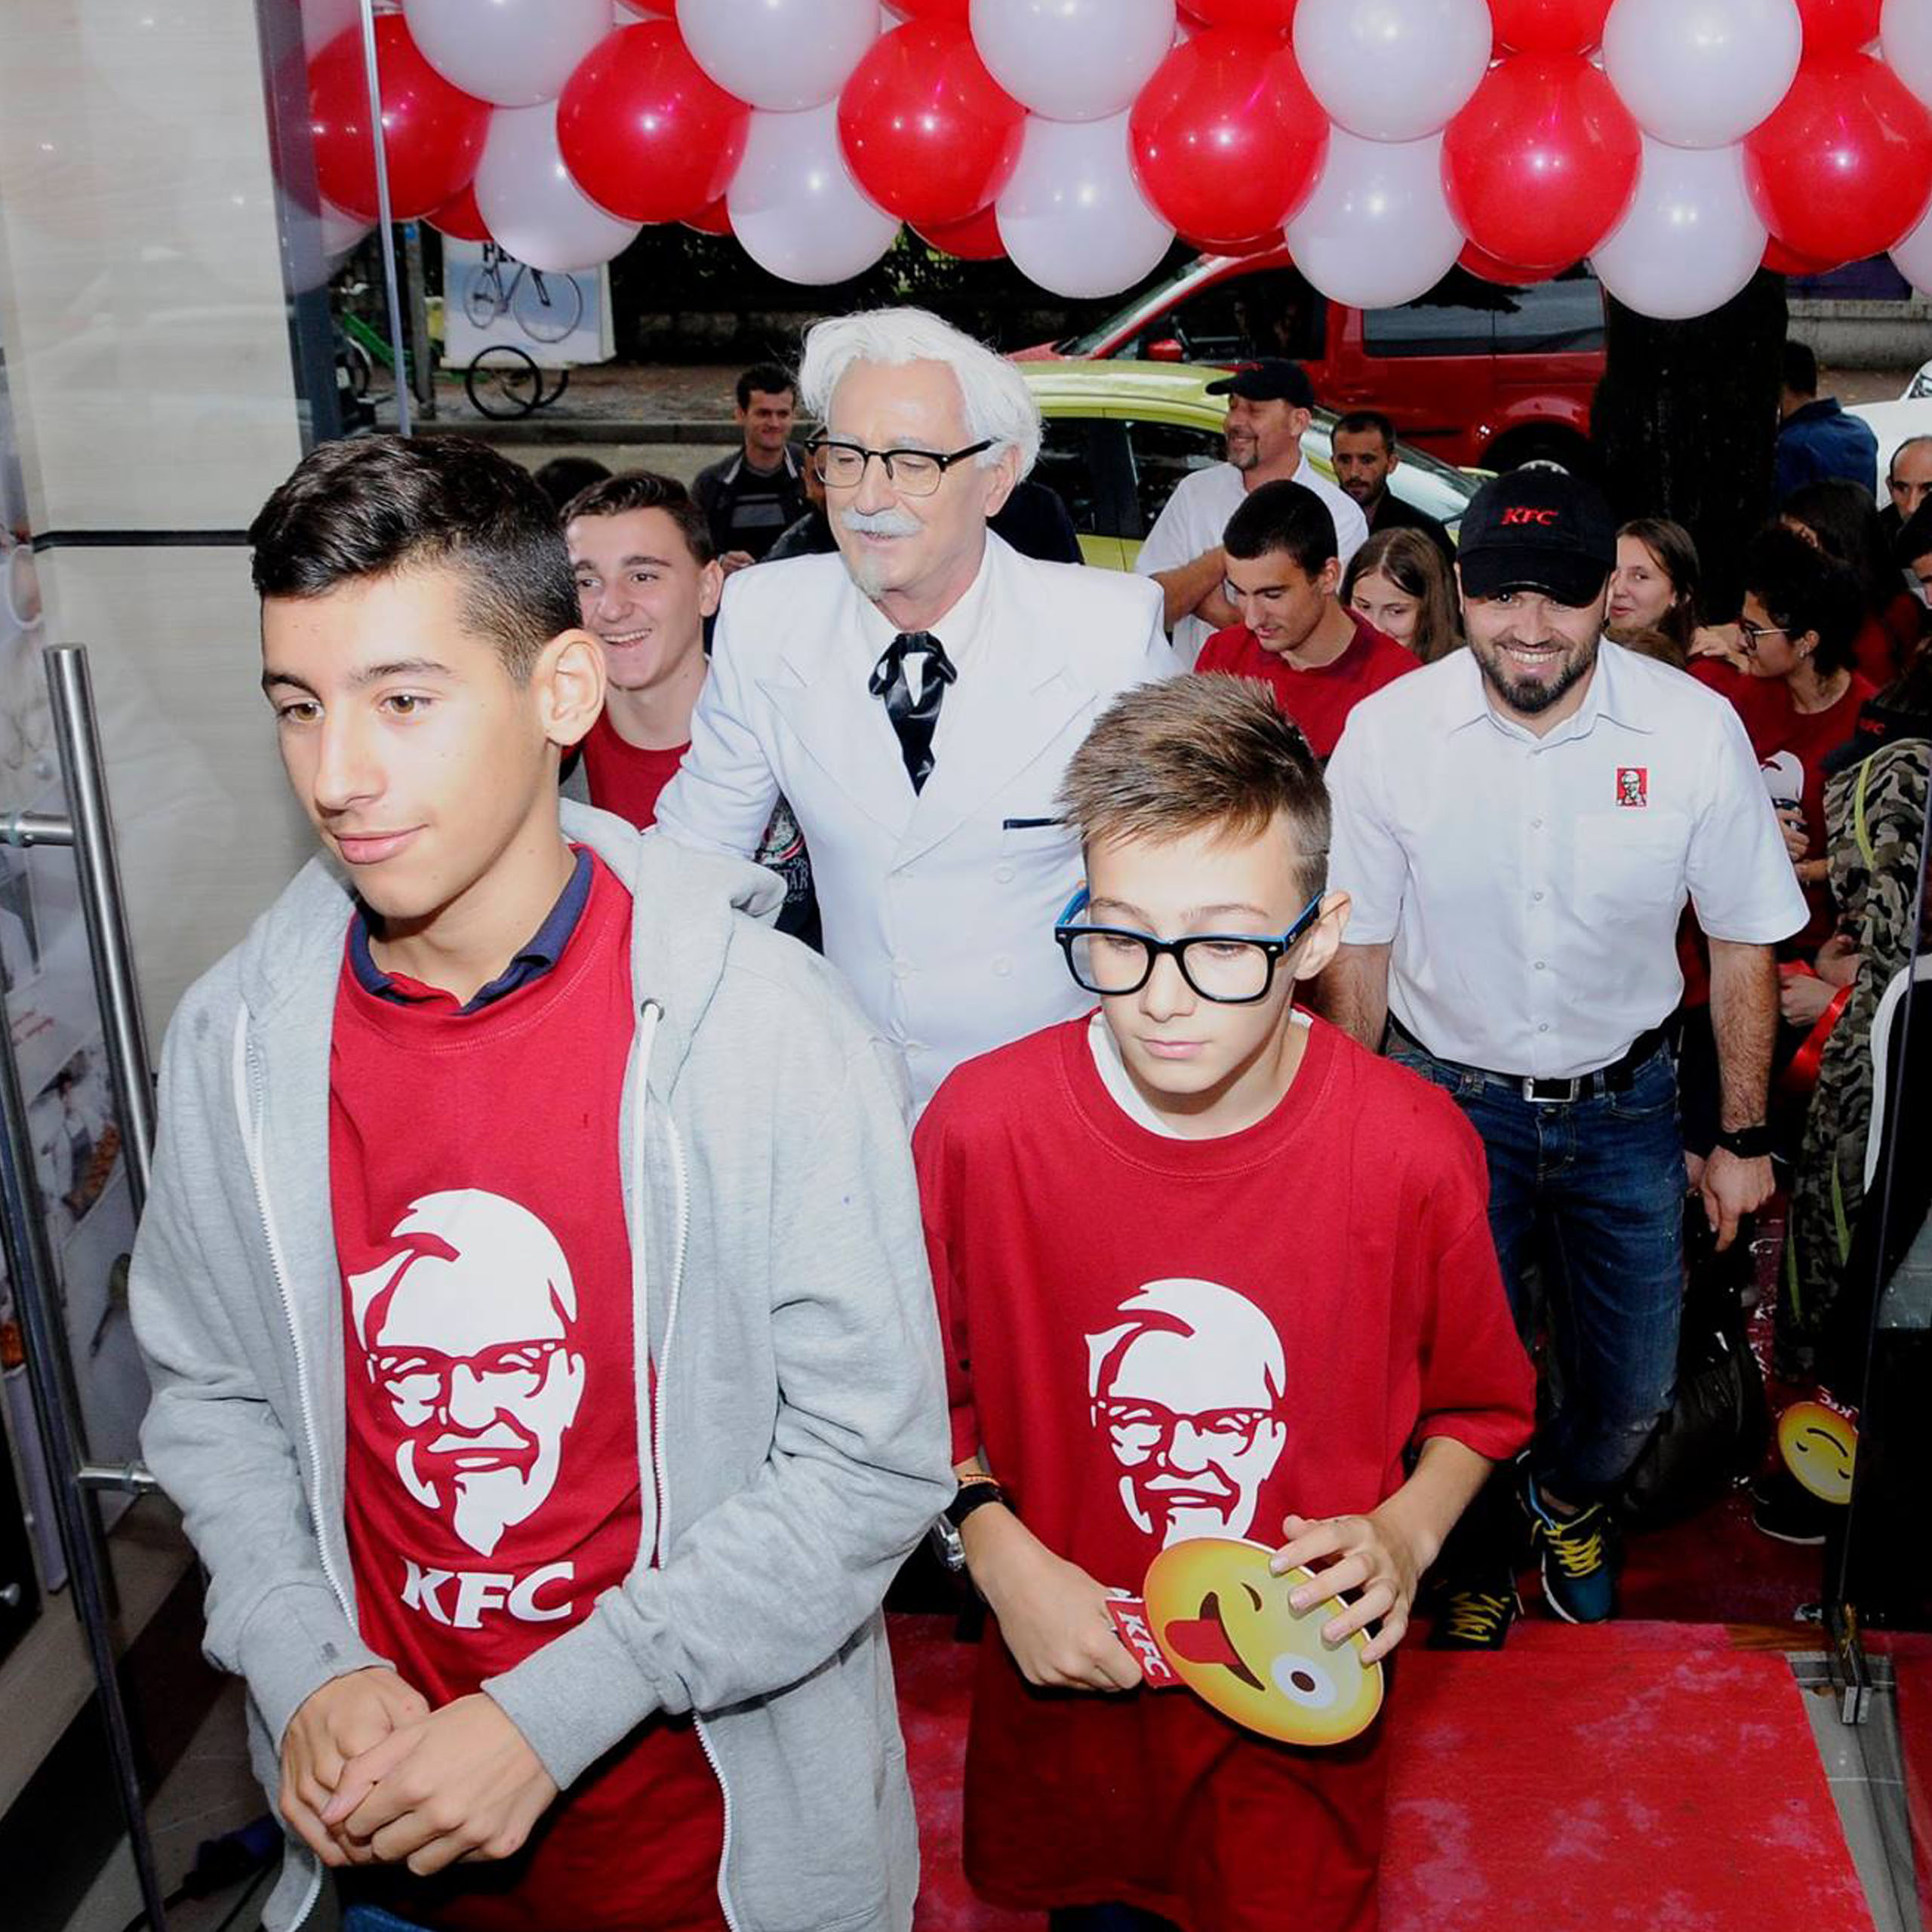 KFC Albania, Project Img 3 - Vatra Agency / Founder & CEO Gerton Bejo